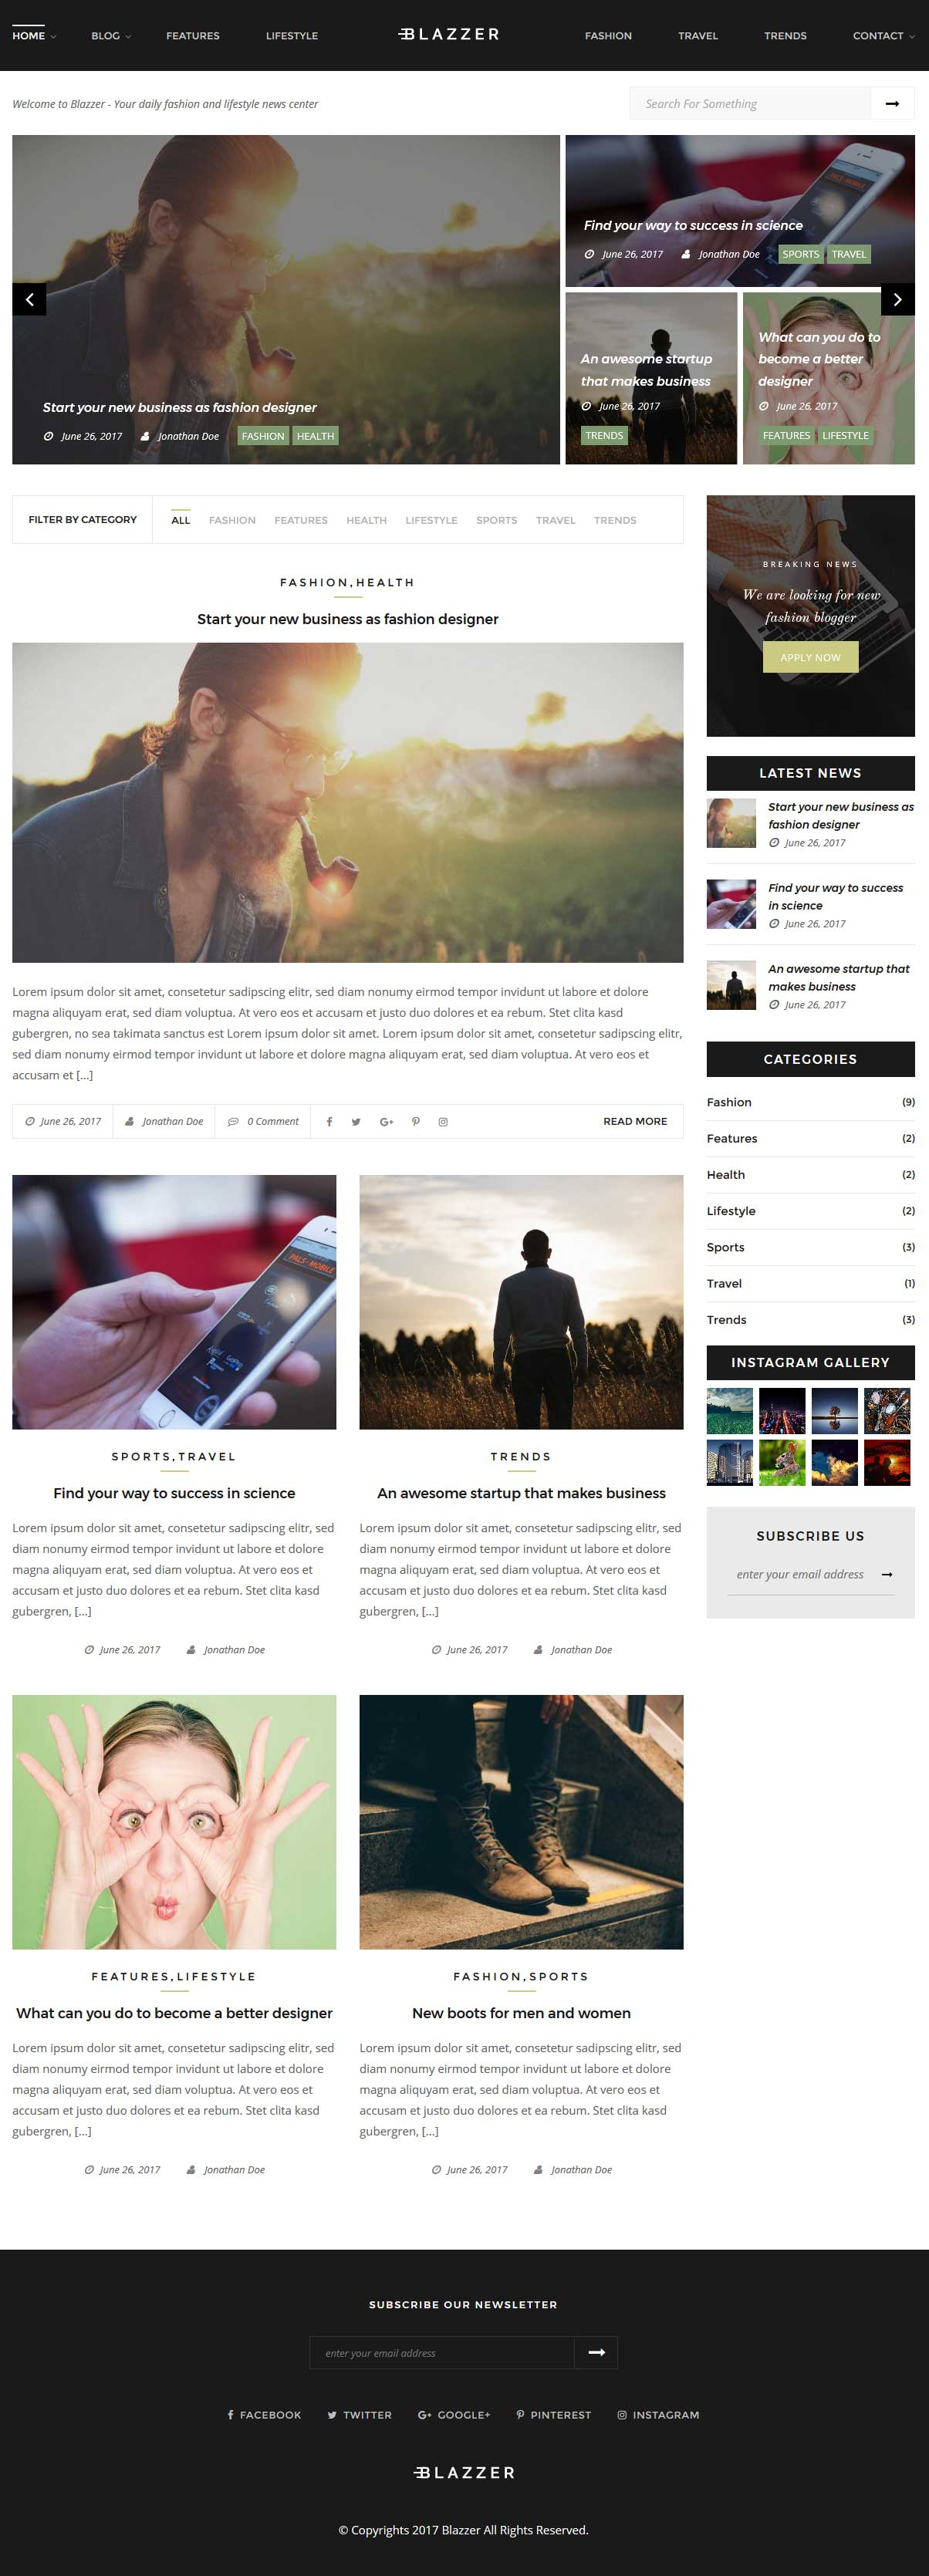 Blazzer - Personal/Fashion Blog WordPress Theme